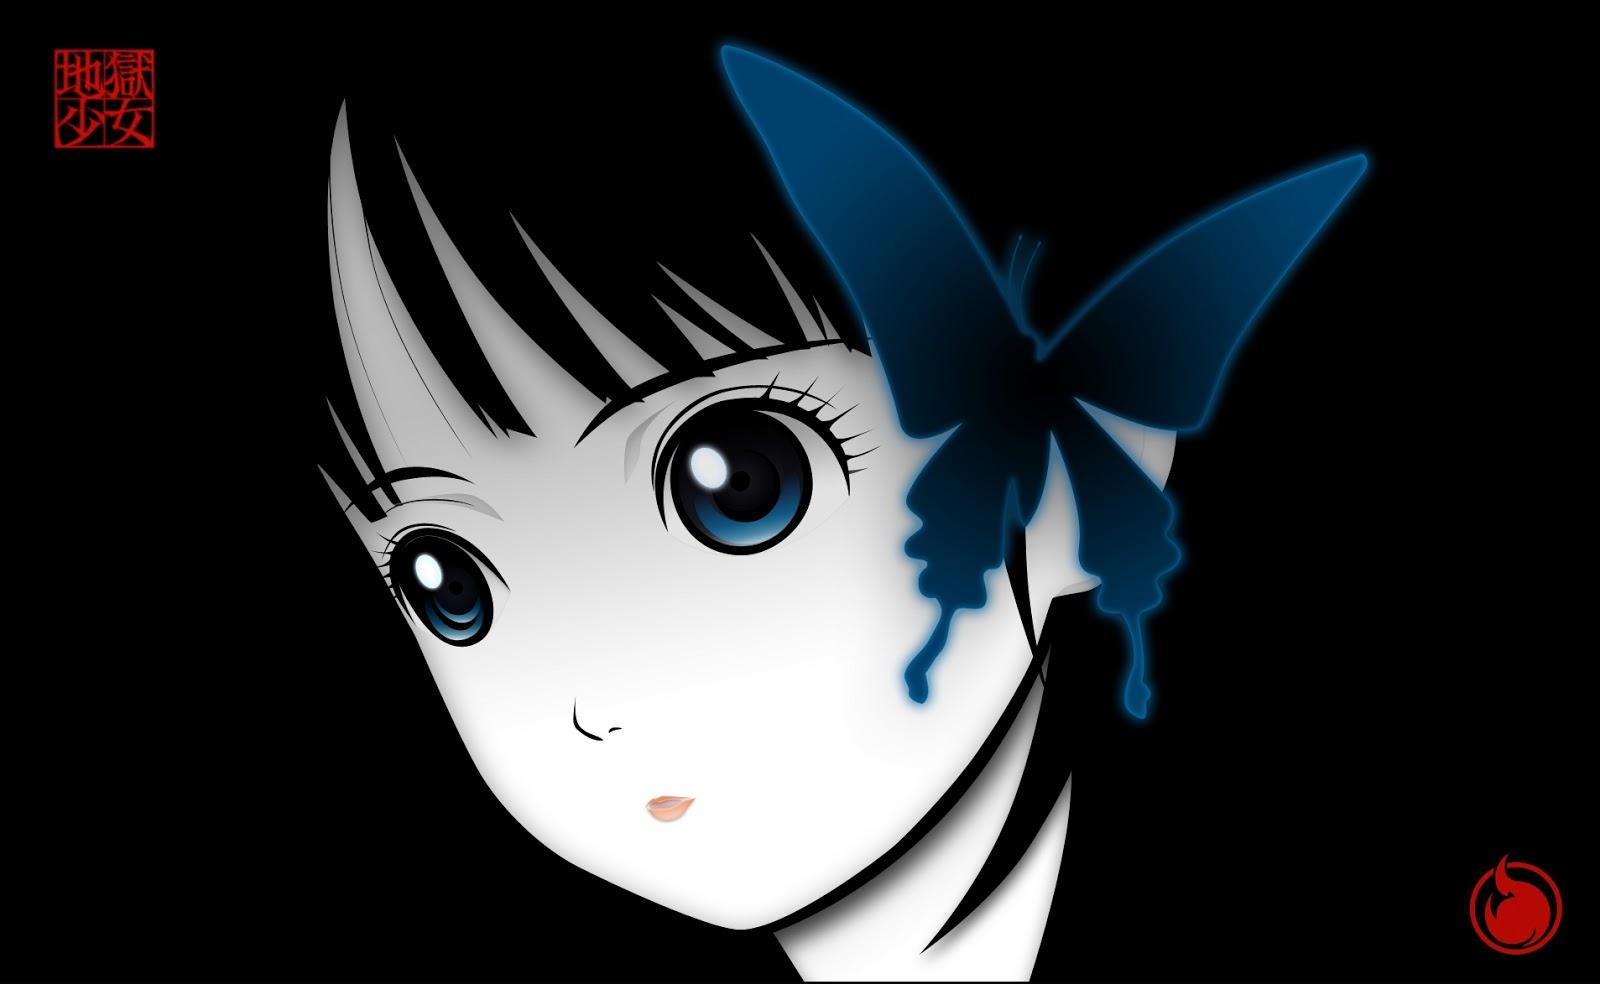 Wallpaper anime hd keren terbaru - Foto anime keren hd ...